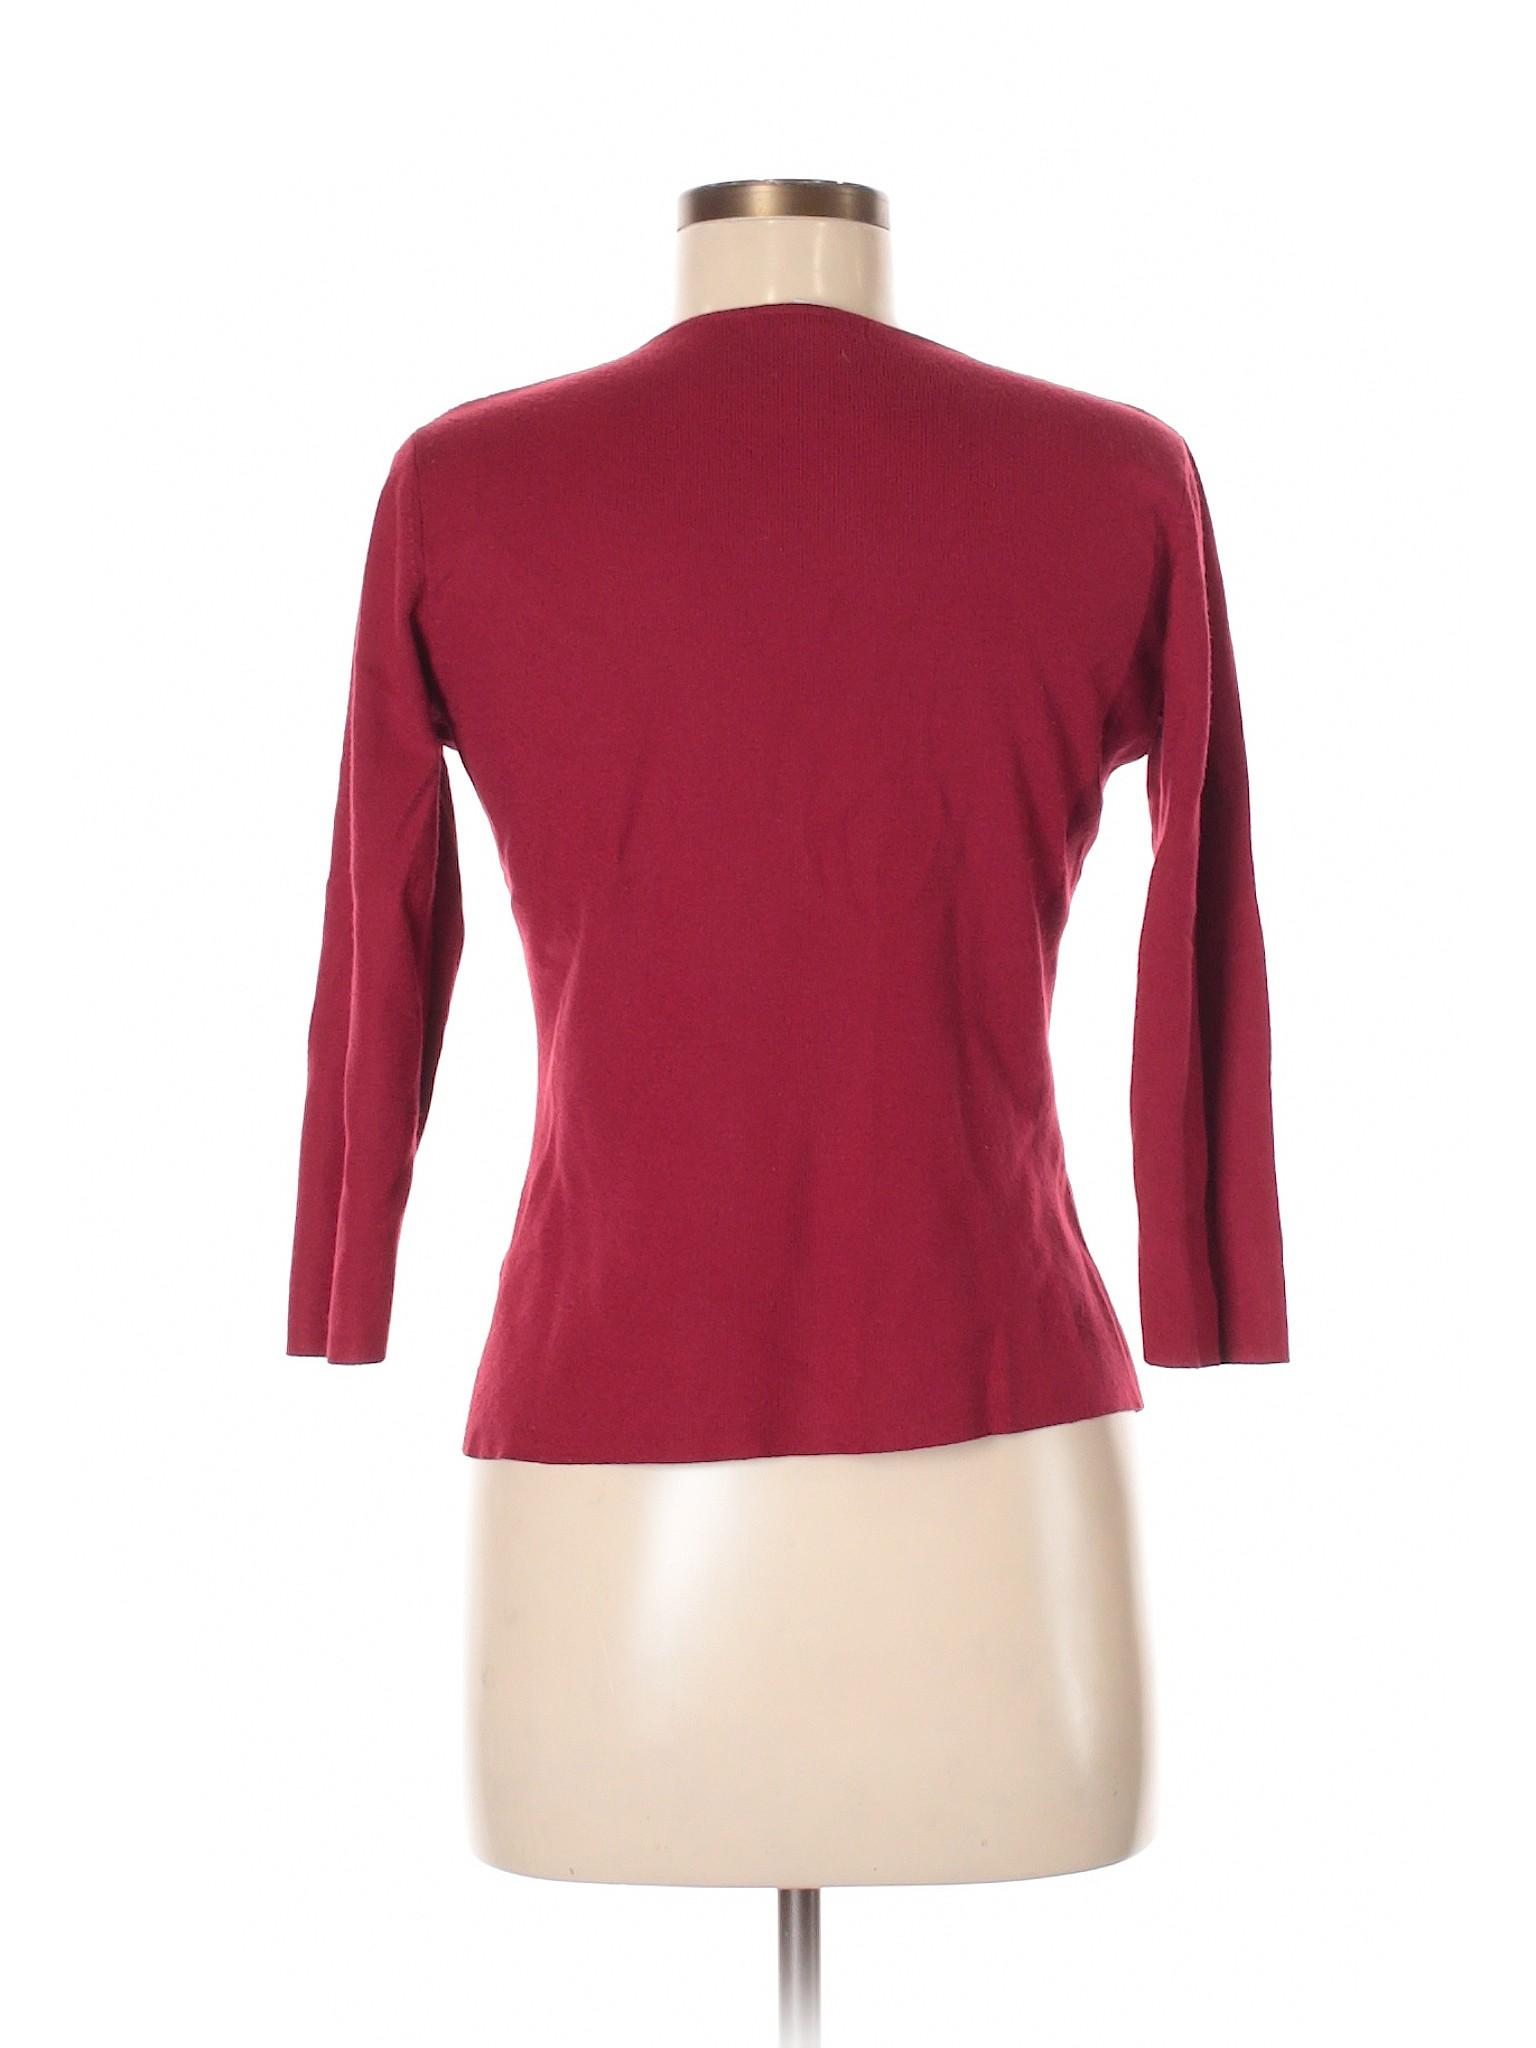 DressBarn Boutique Boutique Sweater Pullover DressBarn EWBTUyqB0